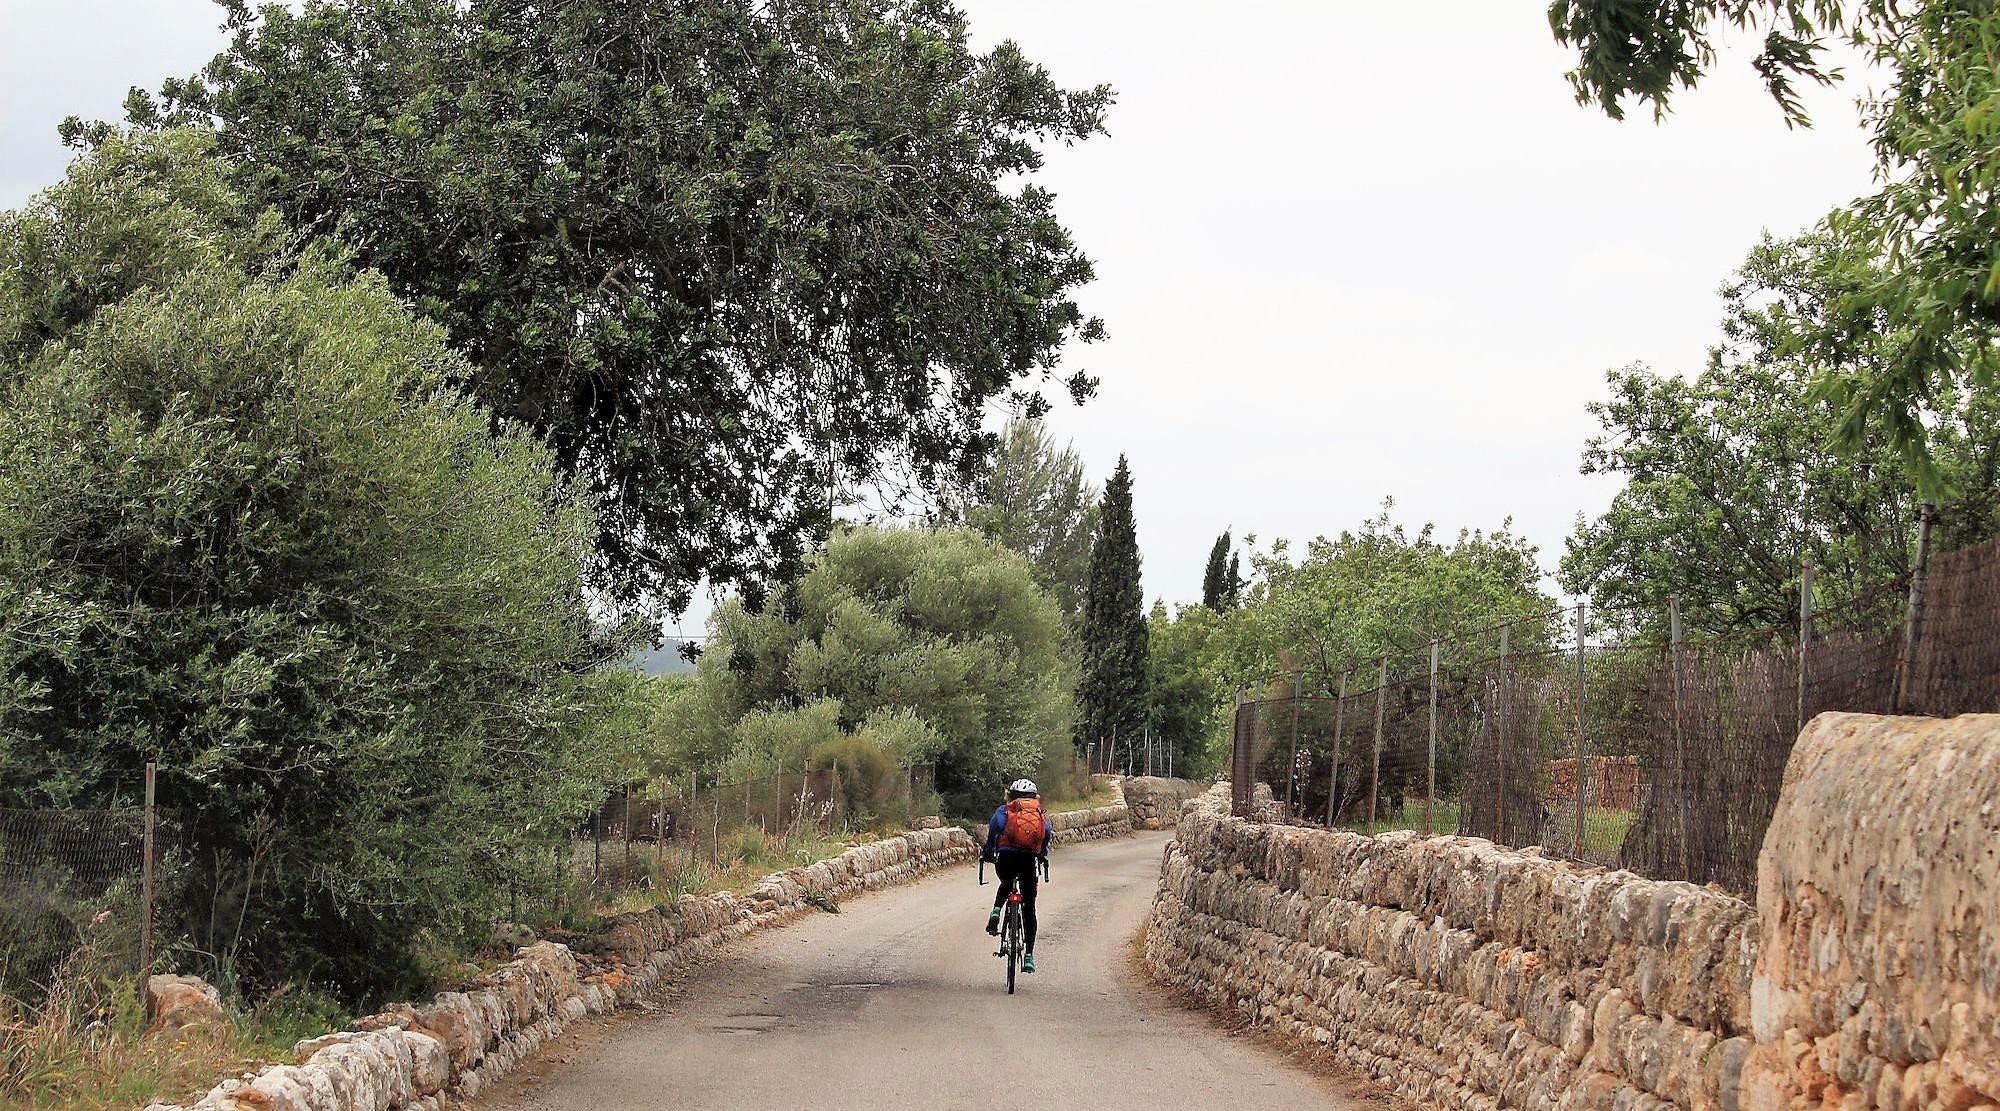 Serra de Tramuntana en bicicleta. Alaro 4. BICIS EN RUTA. 1170x650